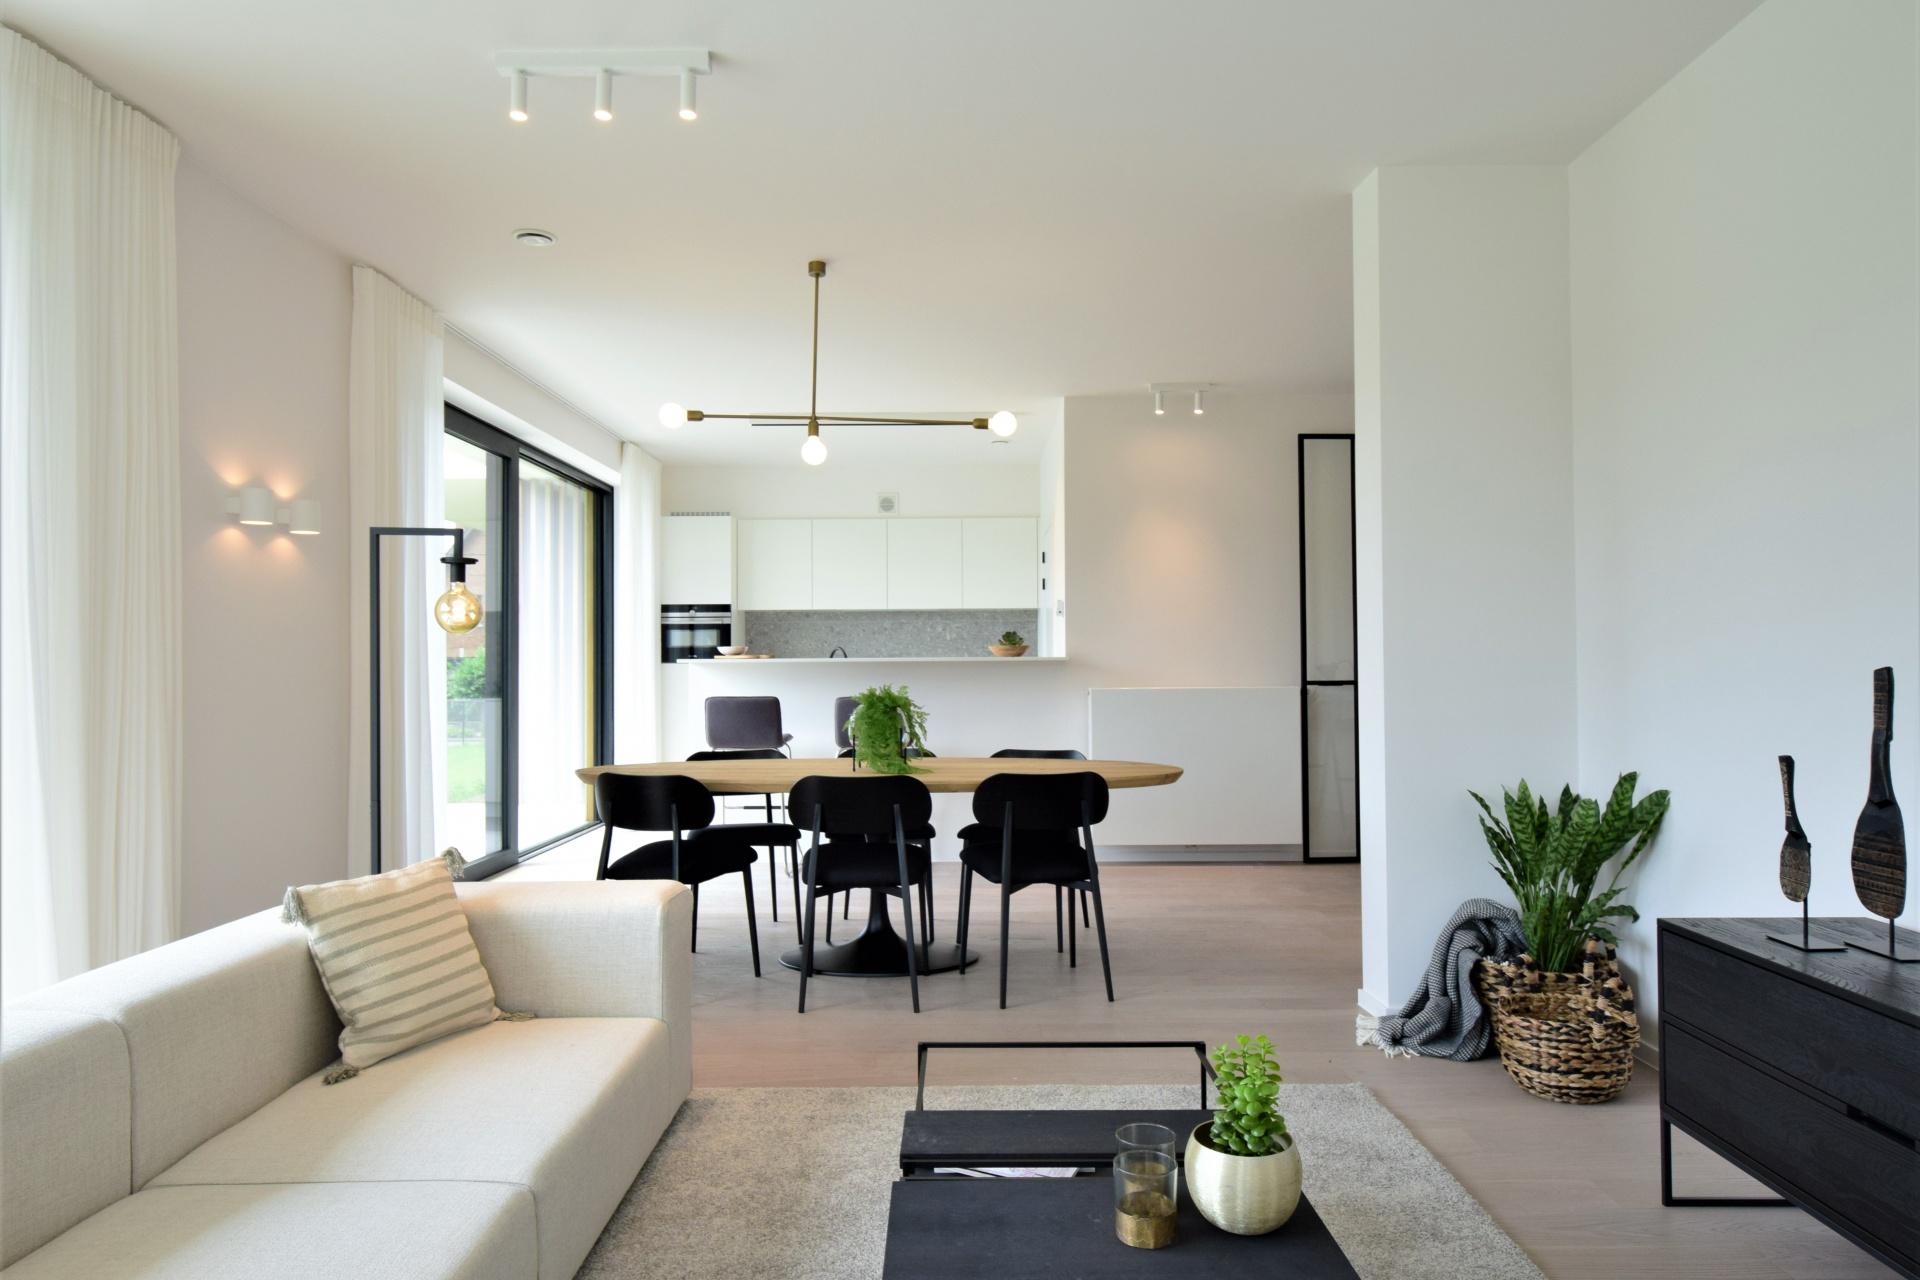 groenzicht roeselare, homestaging, steenoven, casa nova vastgoedstyling